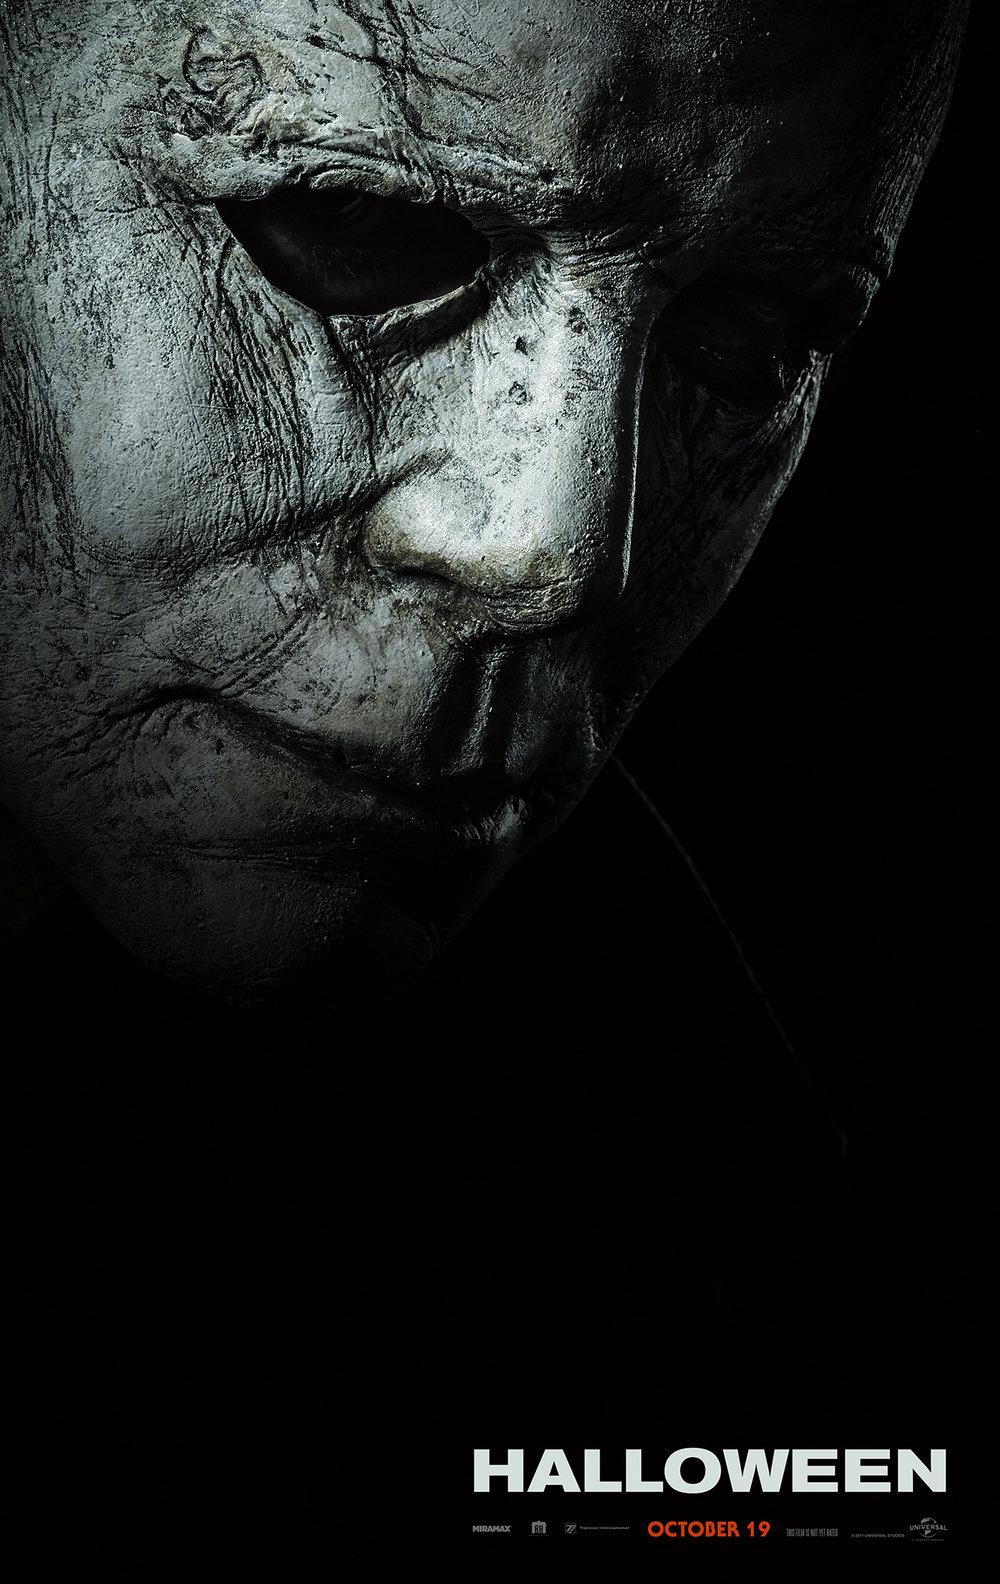 Halloween_Tsr1Sheet_RGB_100dpi.jpg